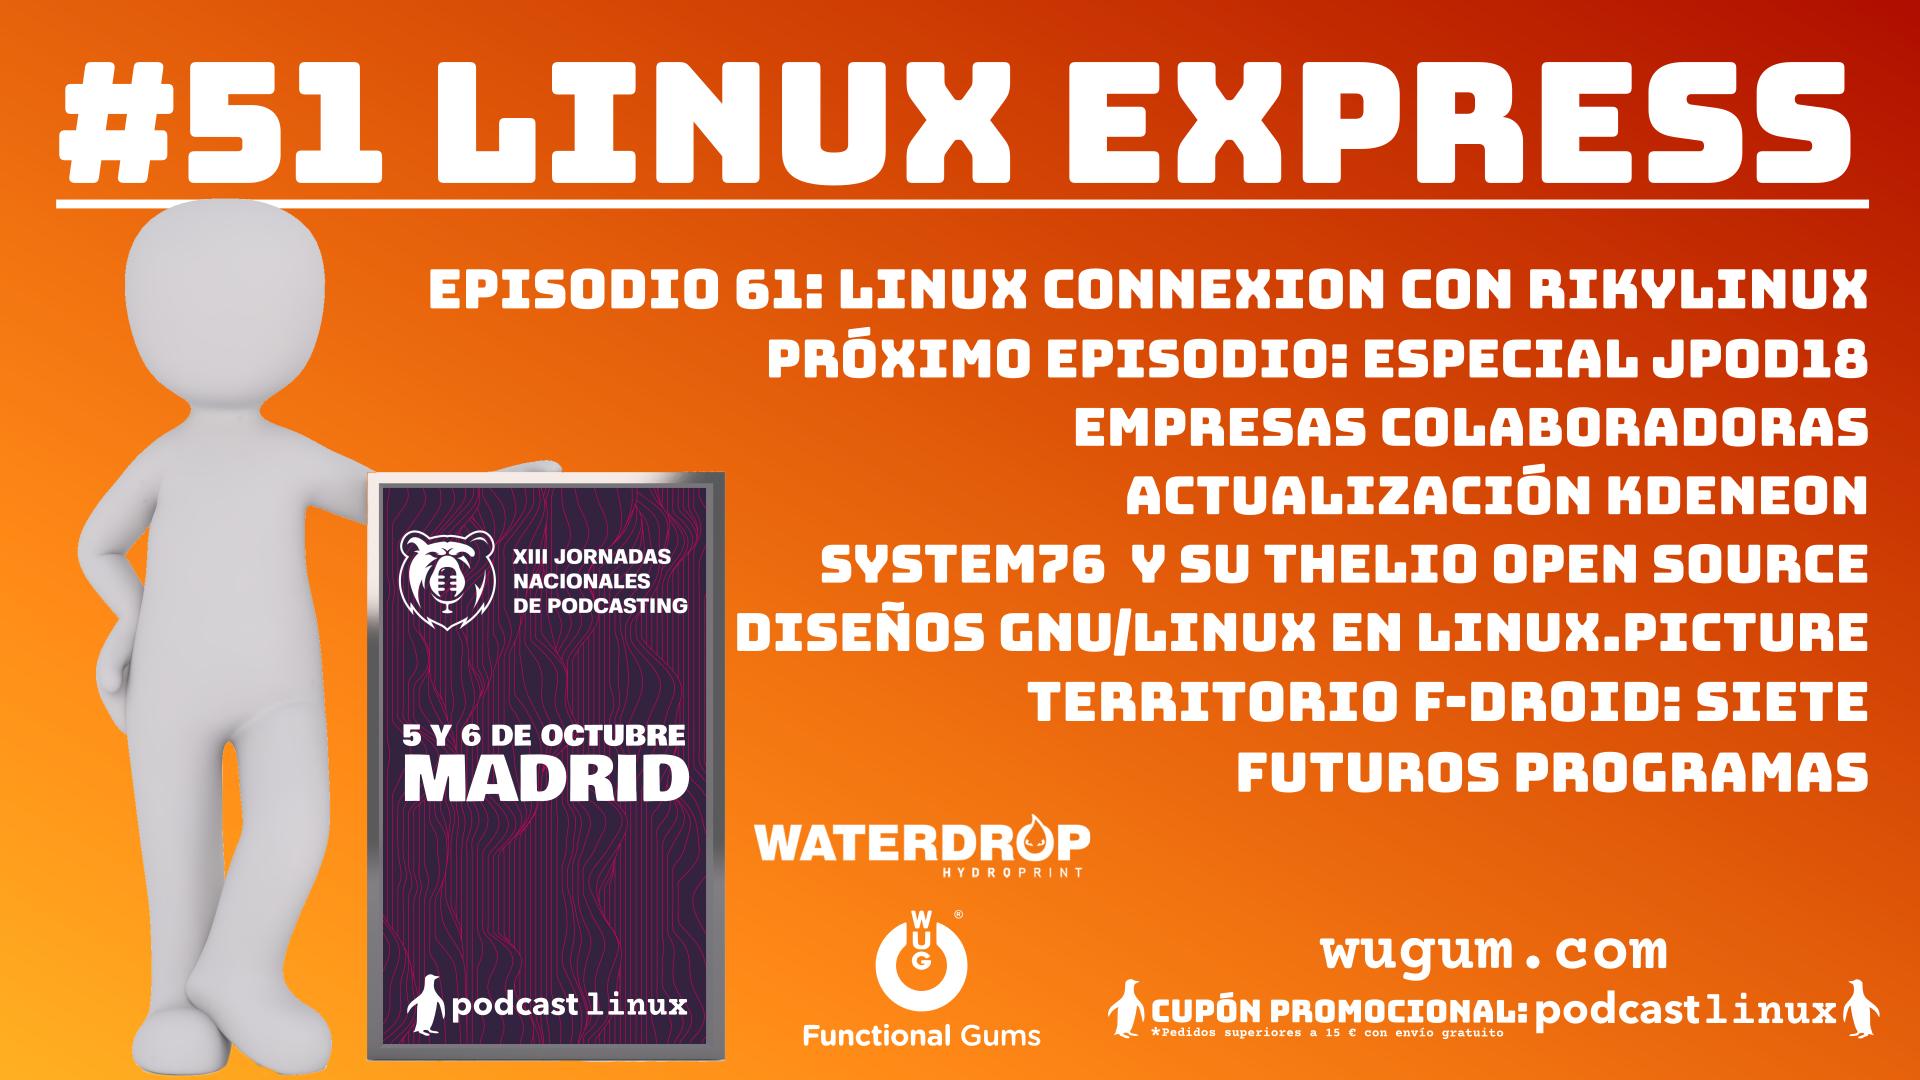 #51 Linux Express